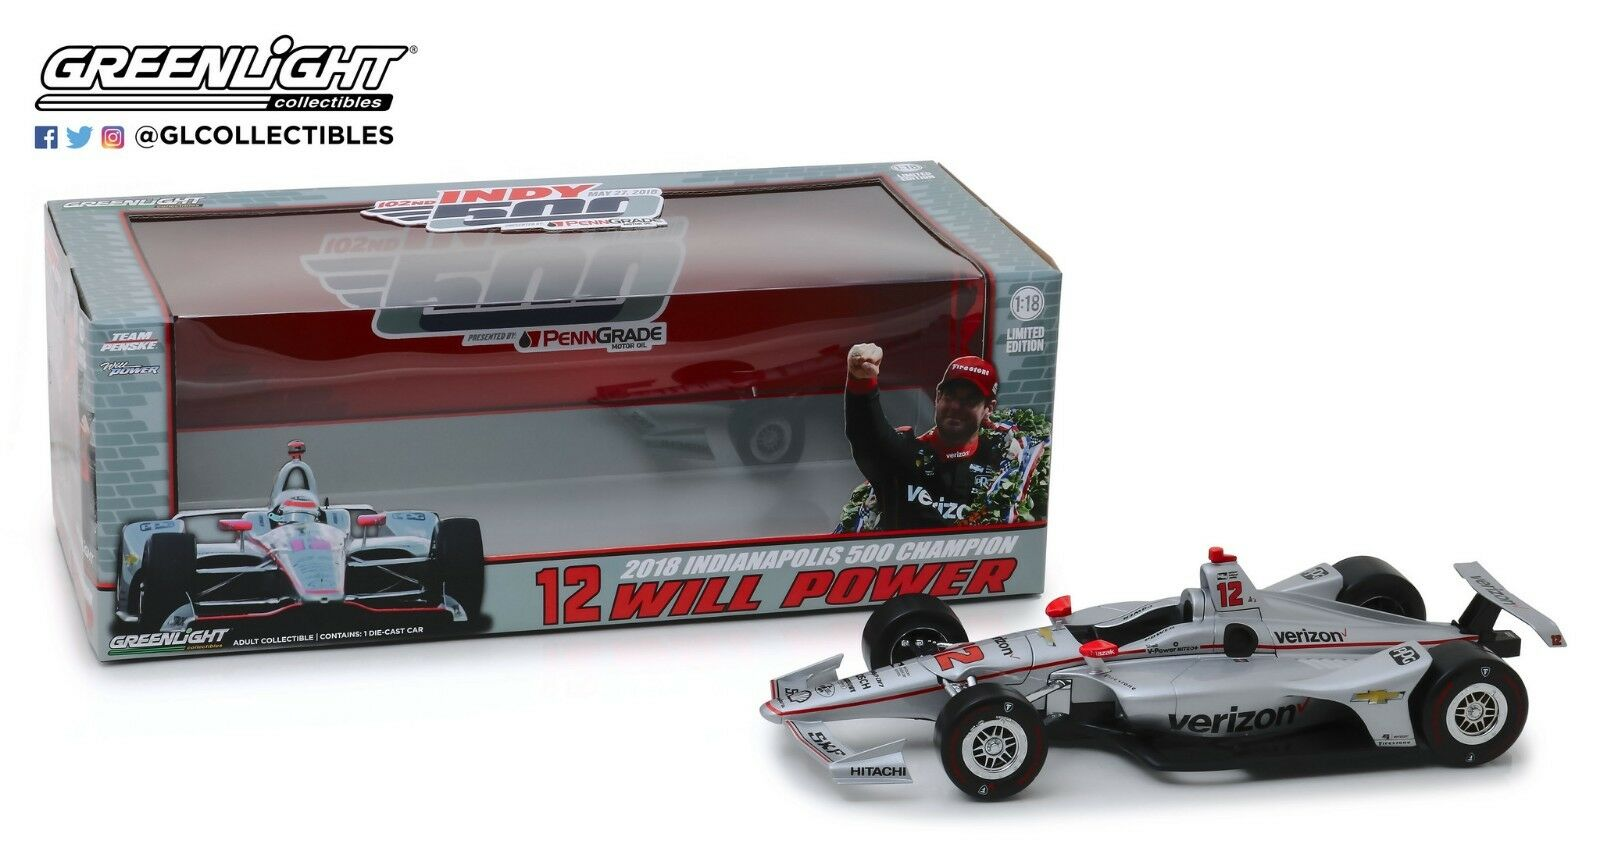 producto de calidad verdeLight verdeLight verdeLight 1 18 2018  12 Will Power Team Penske  Indianapolis 500 Champion 11046  ¡envío gratis!